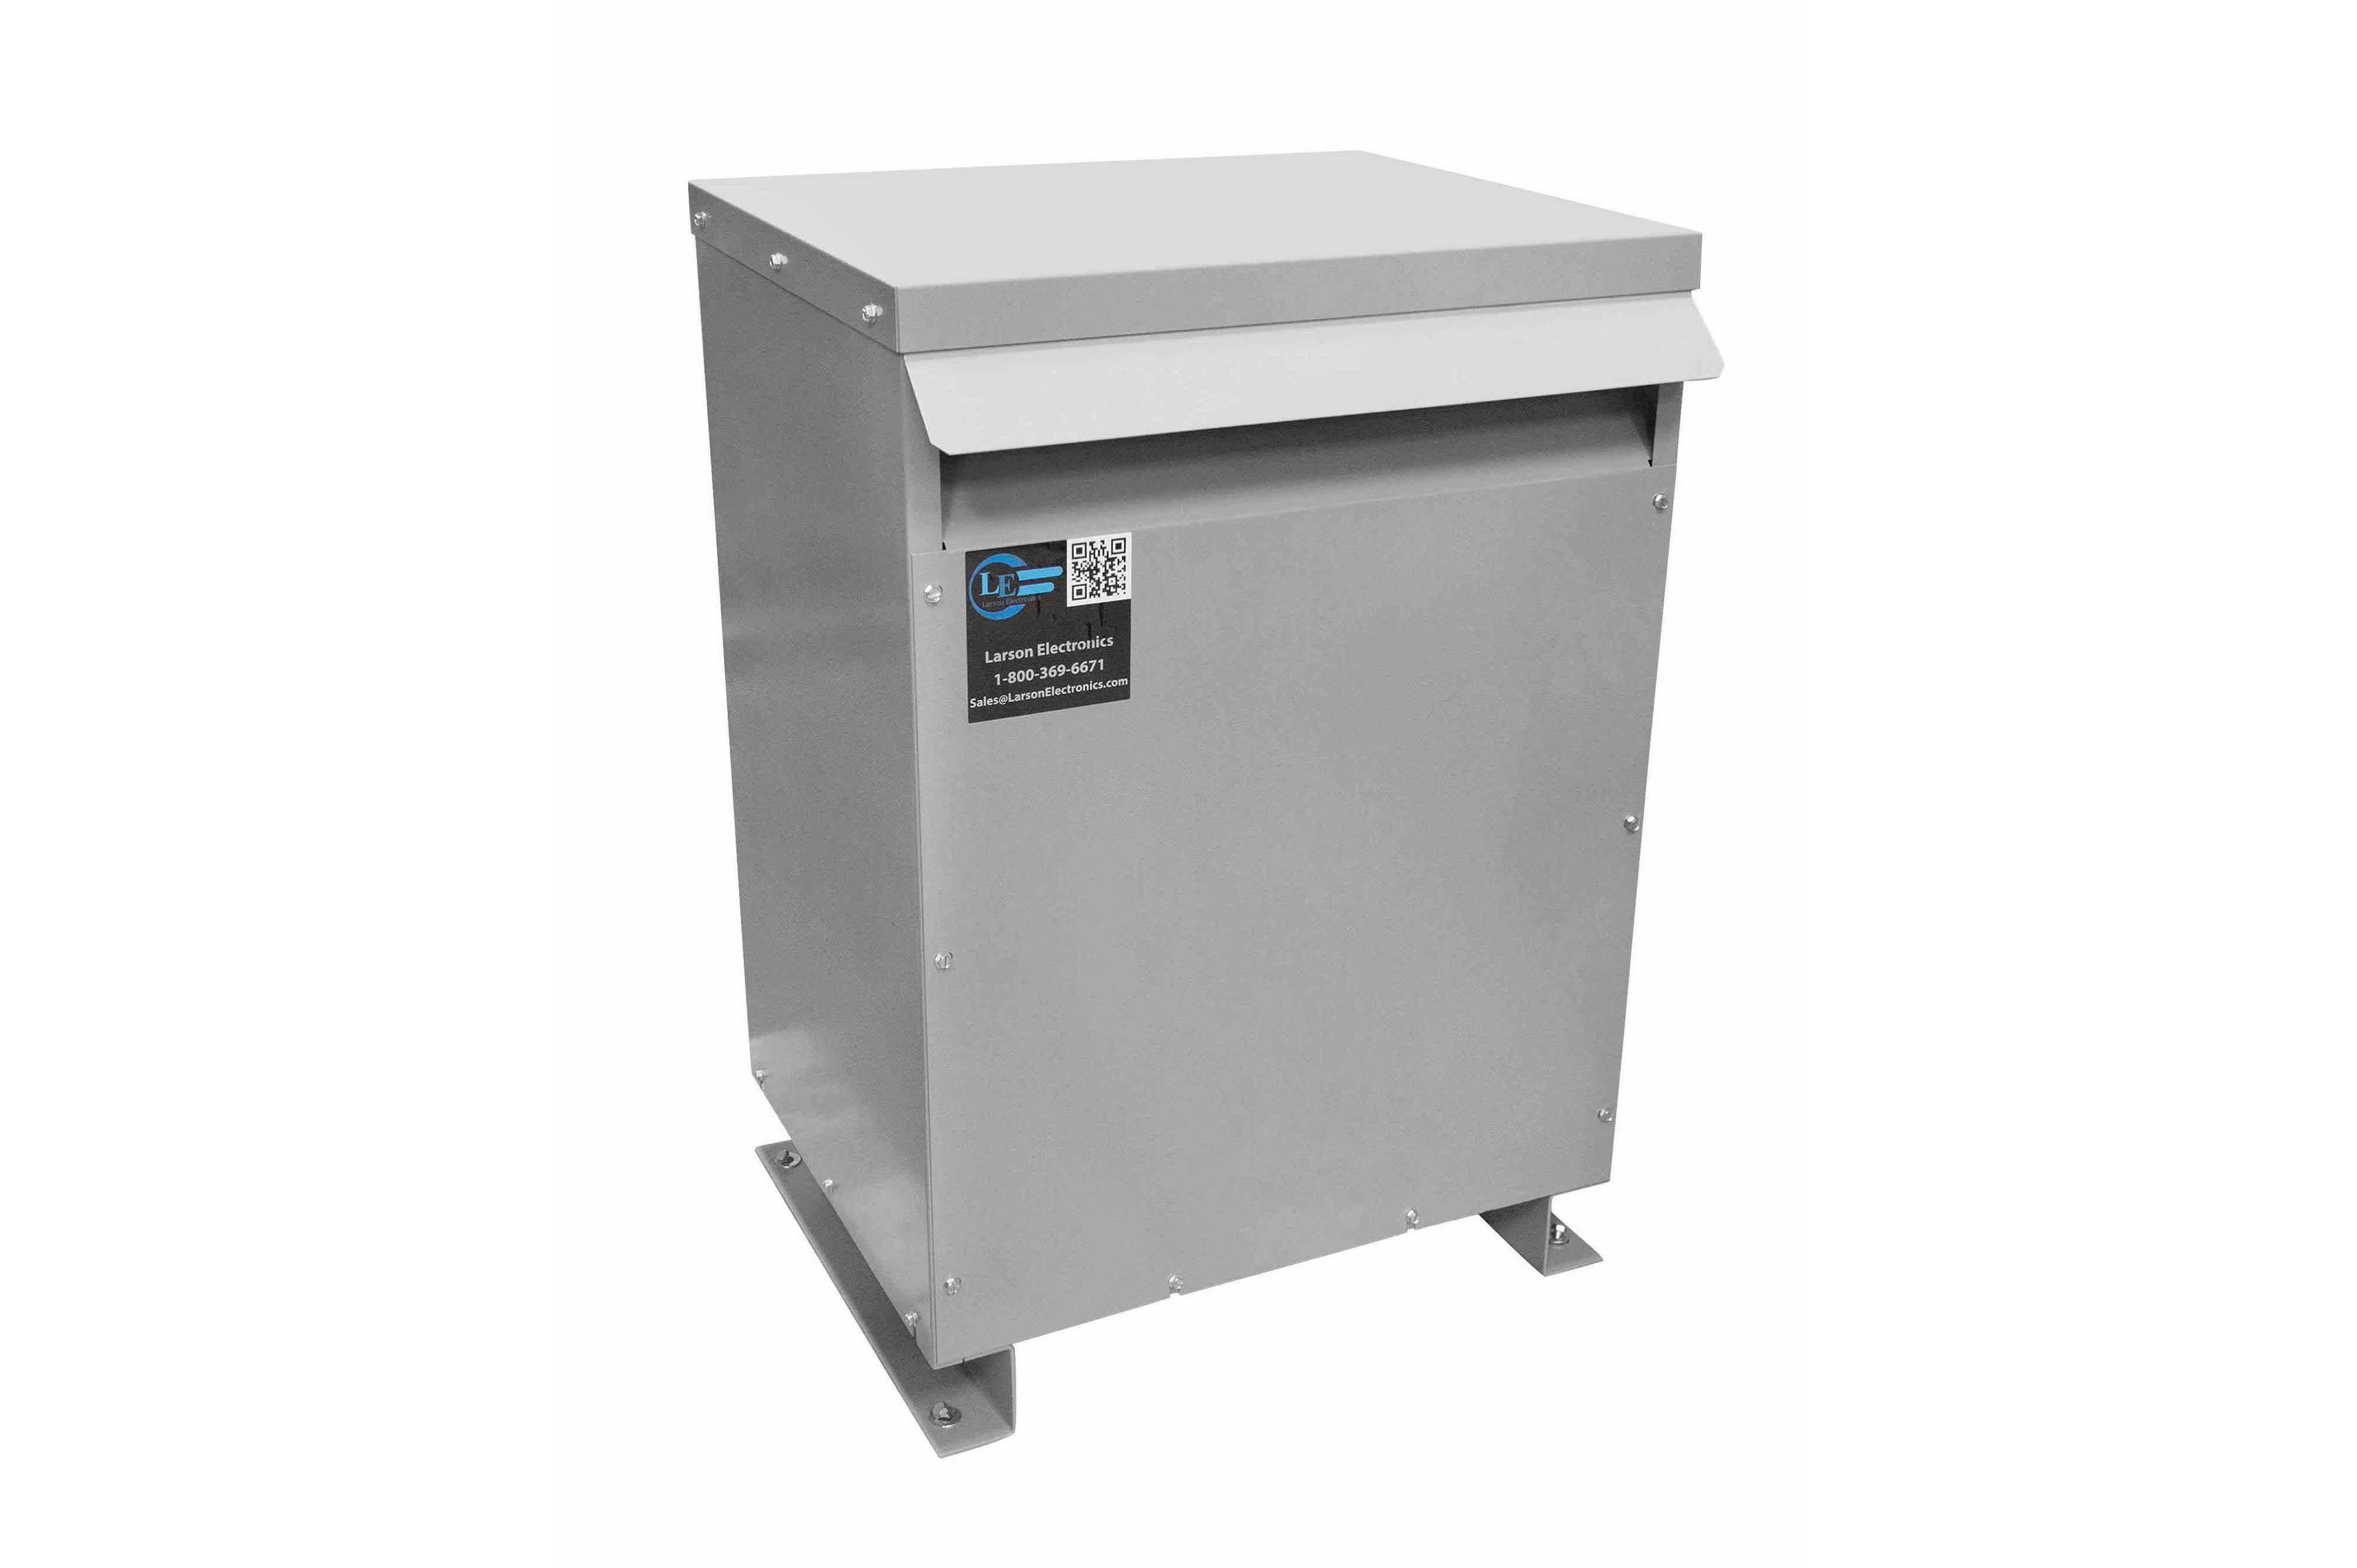 70 kVA 3PH Isolation Transformer, 480V Wye Primary, 415V Delta Secondary, N3R, Ventilated, 60 Hz